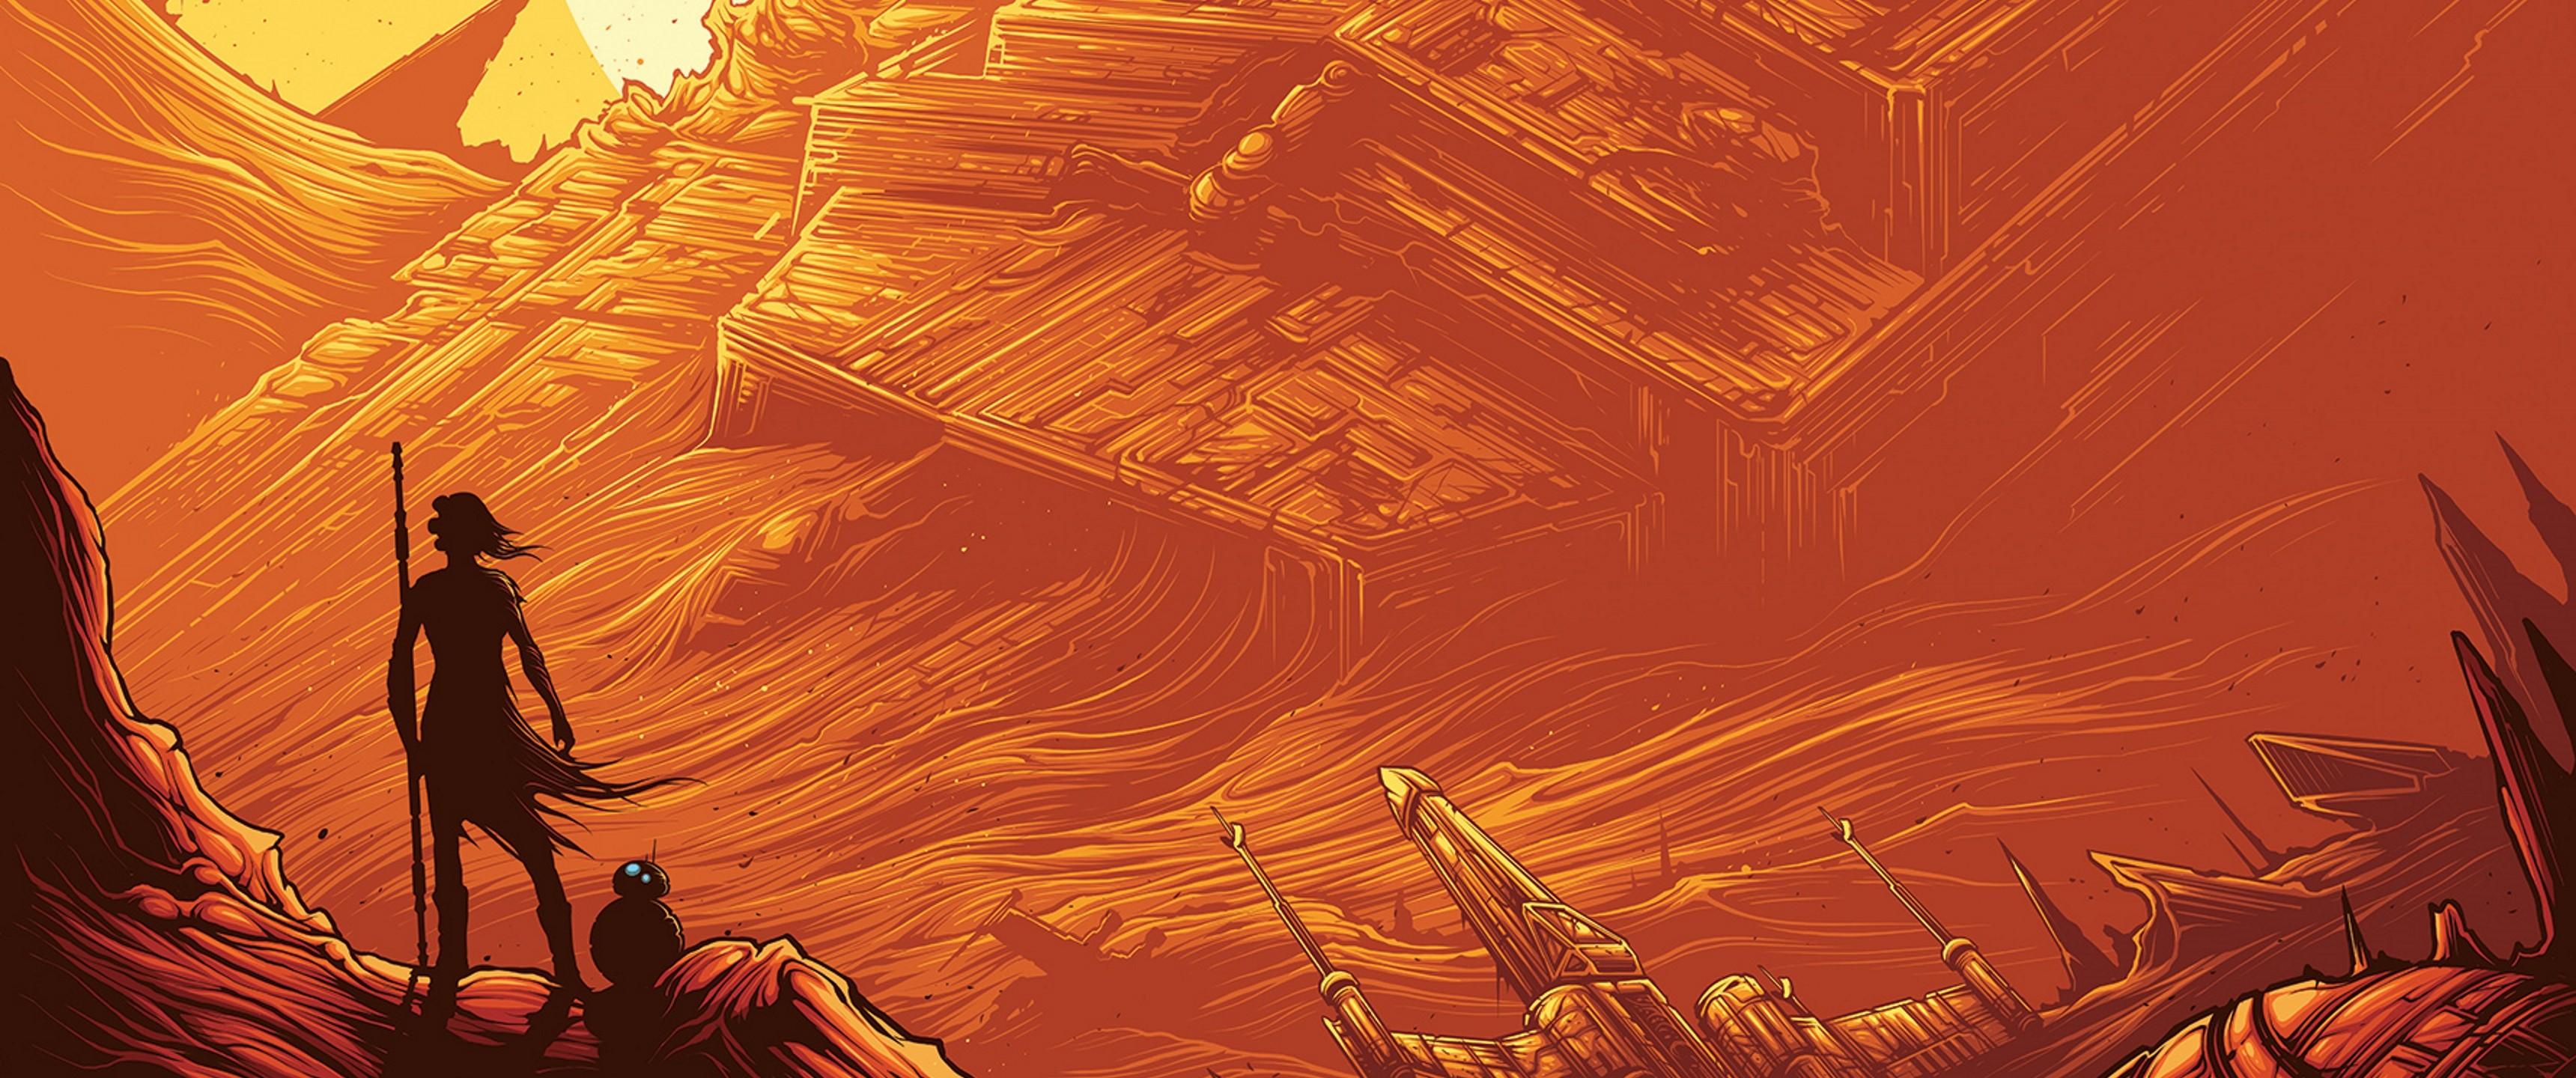 Star Wars The Force Awakens Imax Poster 3440x1440 Download Hd Wallpaper Wallpapertip